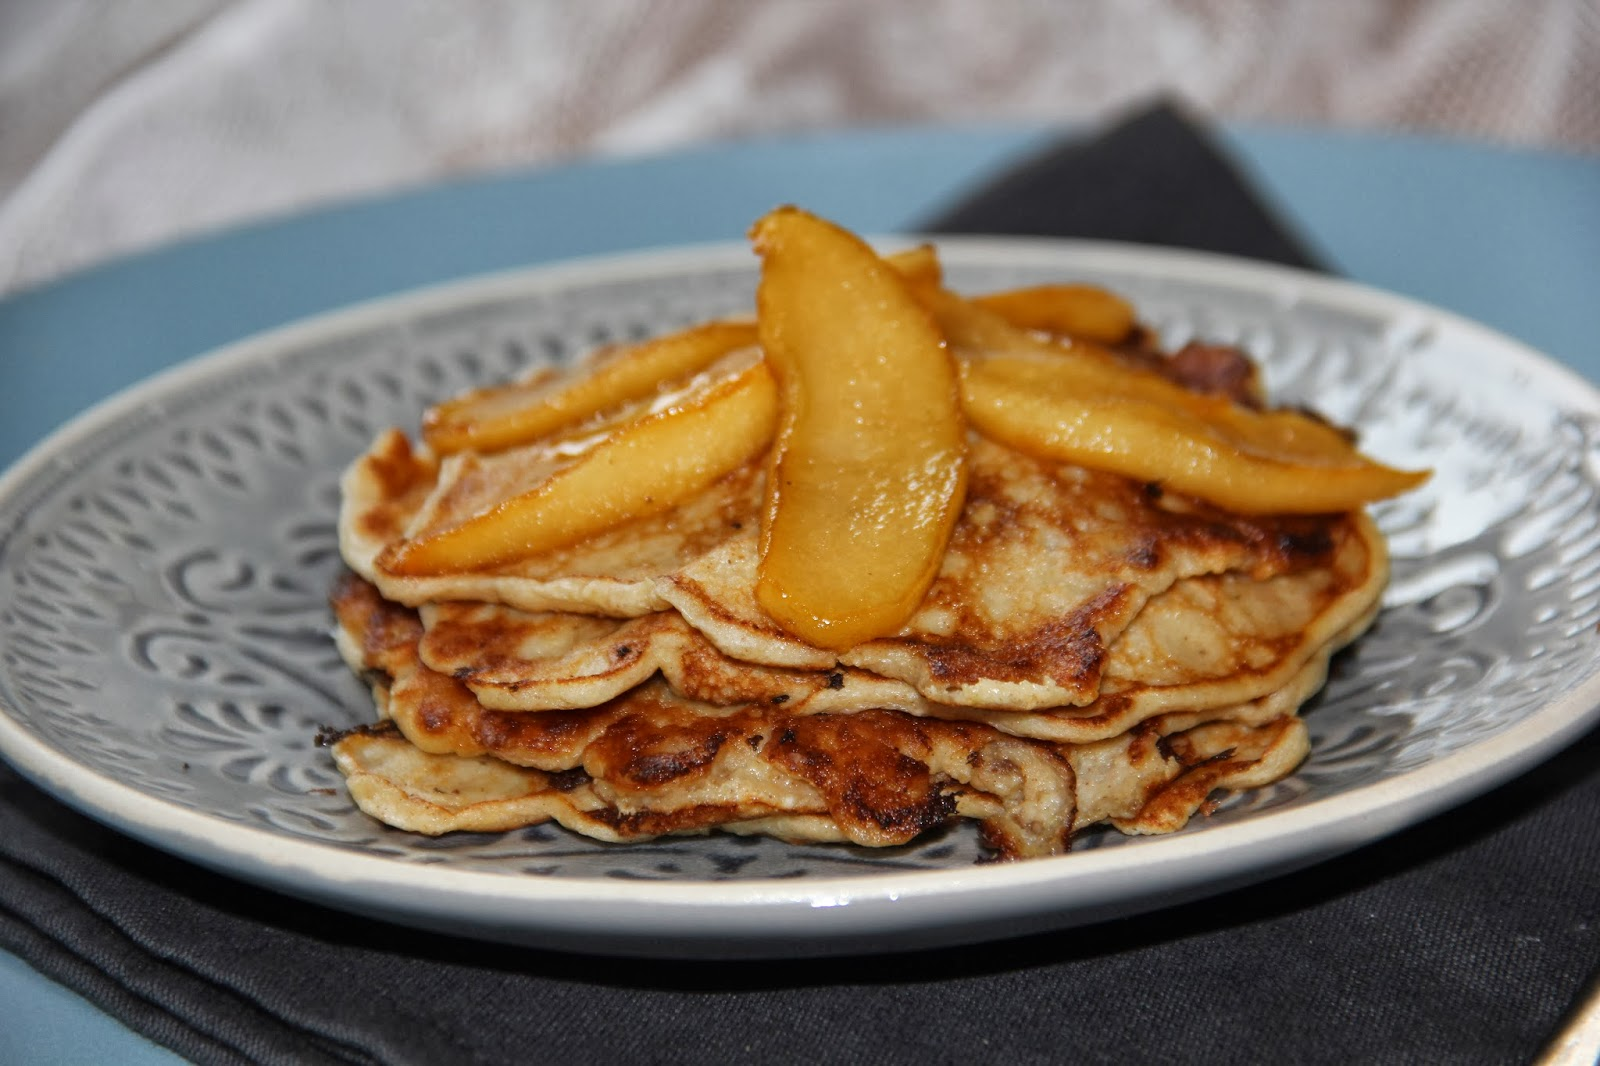 Havermout pannenkoekjes met gekarameliseerde appel - www.desmaakvancecile.com